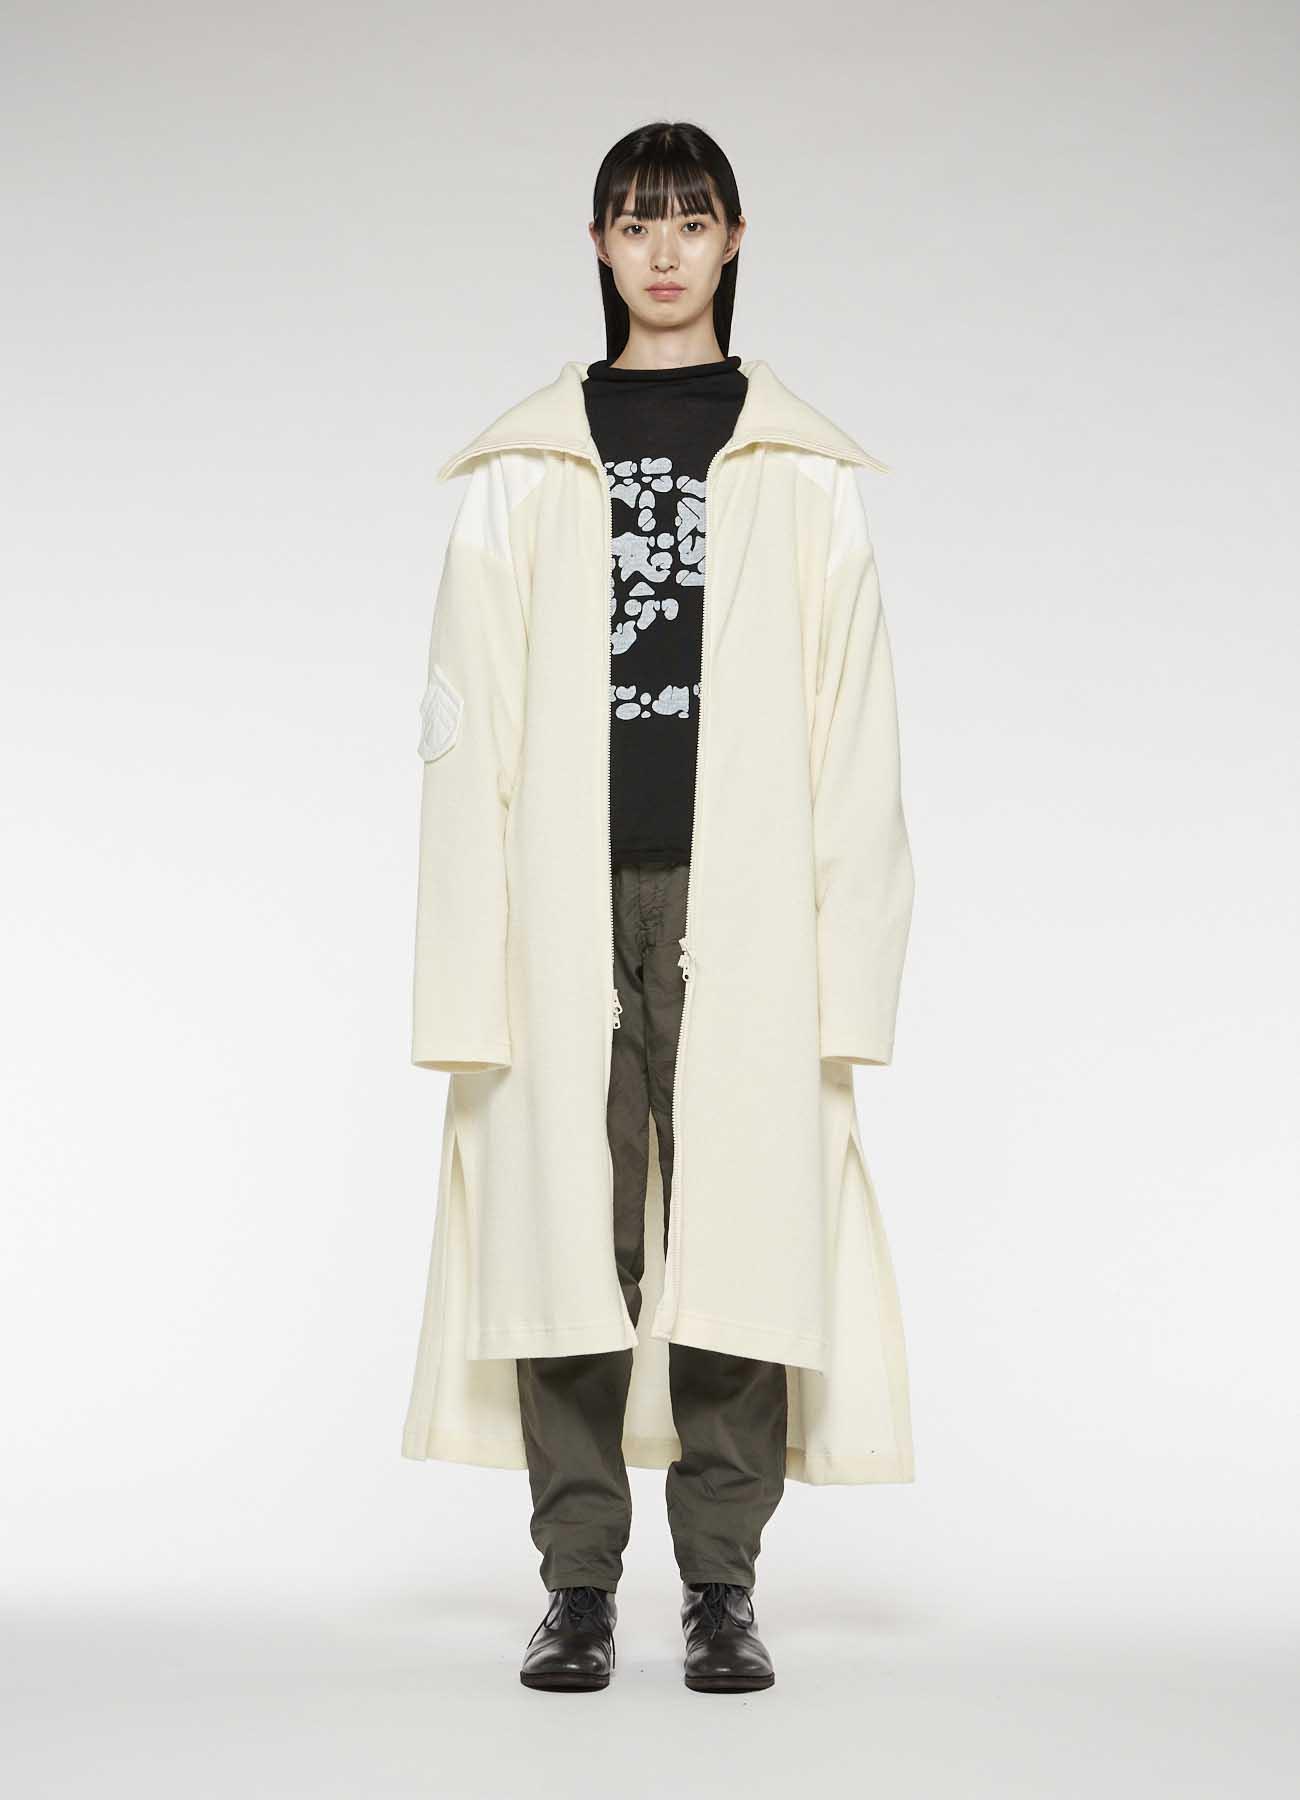 DOUBLE FACE x COTTON SILESIA STAND COLLAR DRESS